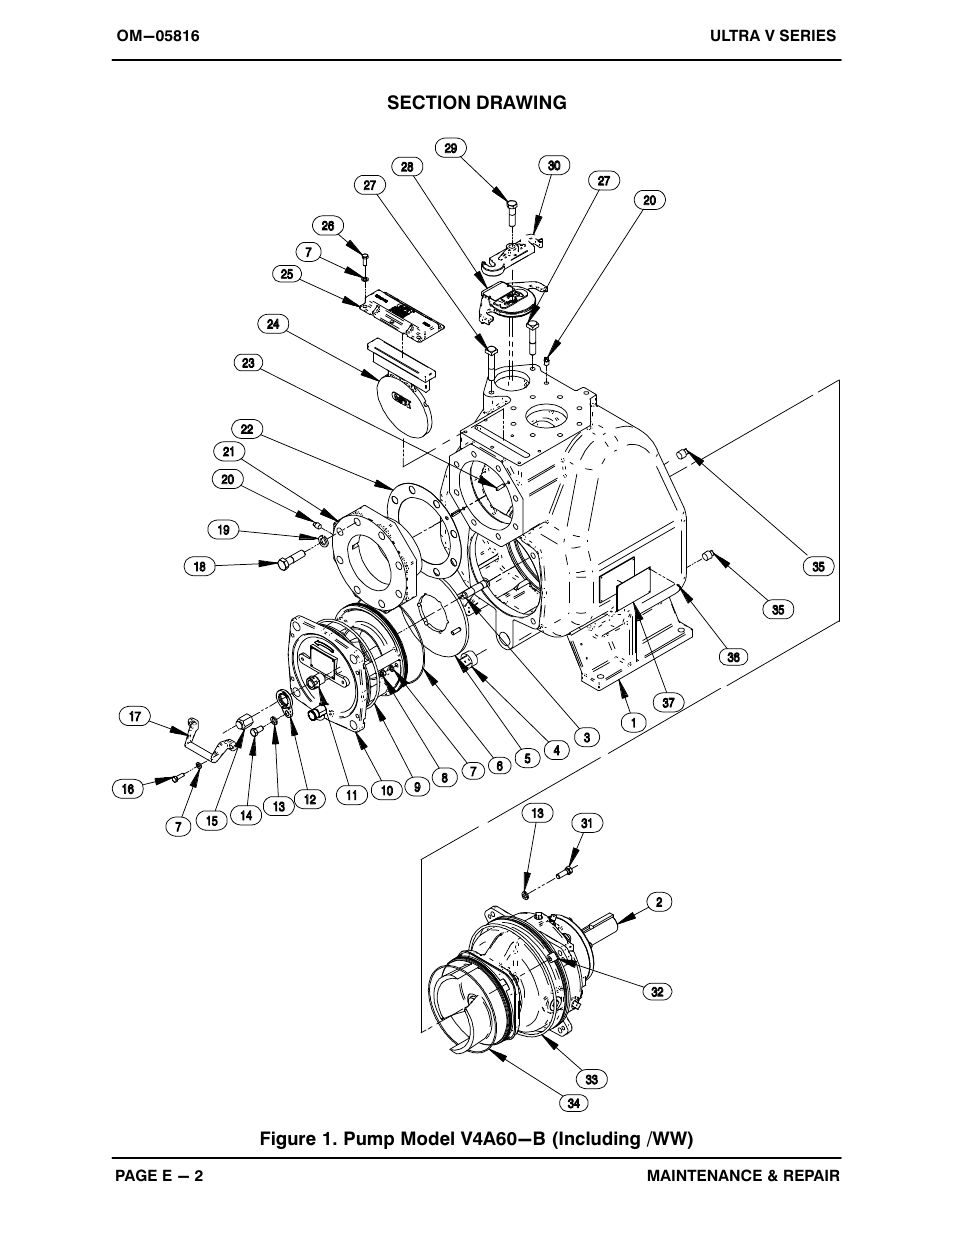 Gorman-Rupp Pumps V4A60-B 1333878 and up User Manual